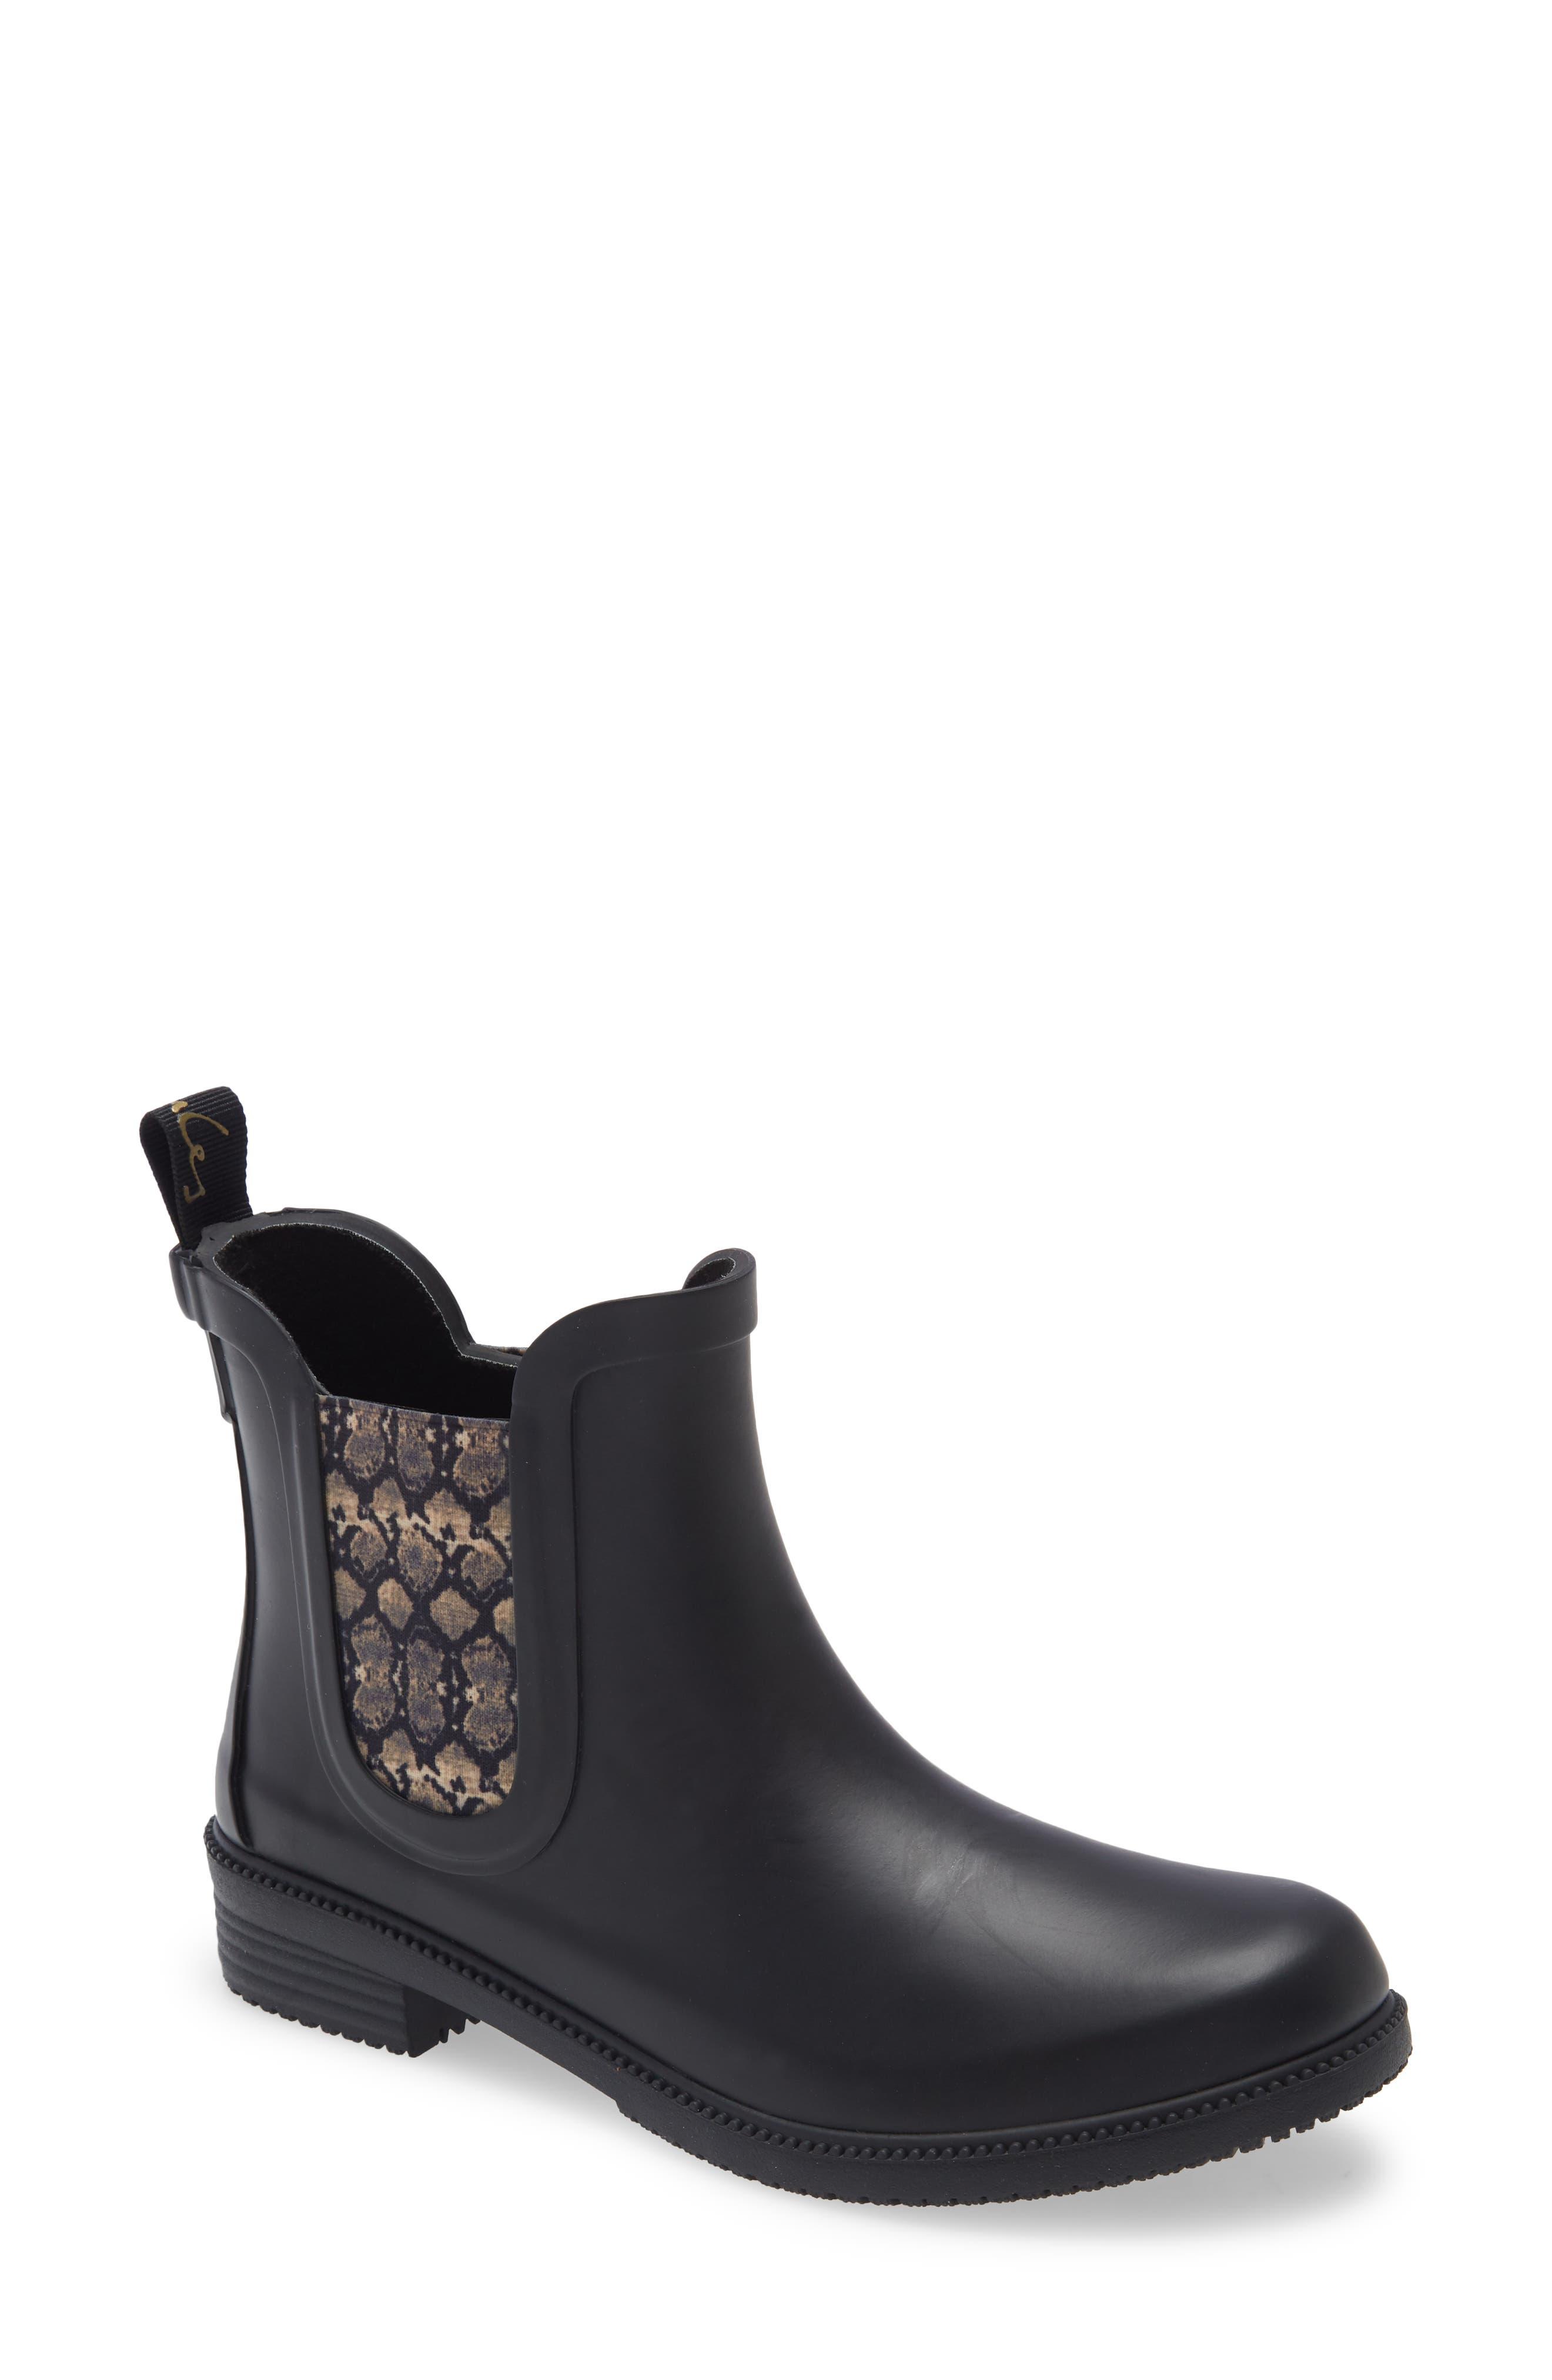 Rutland Waterproof Chelsea Rain Boot